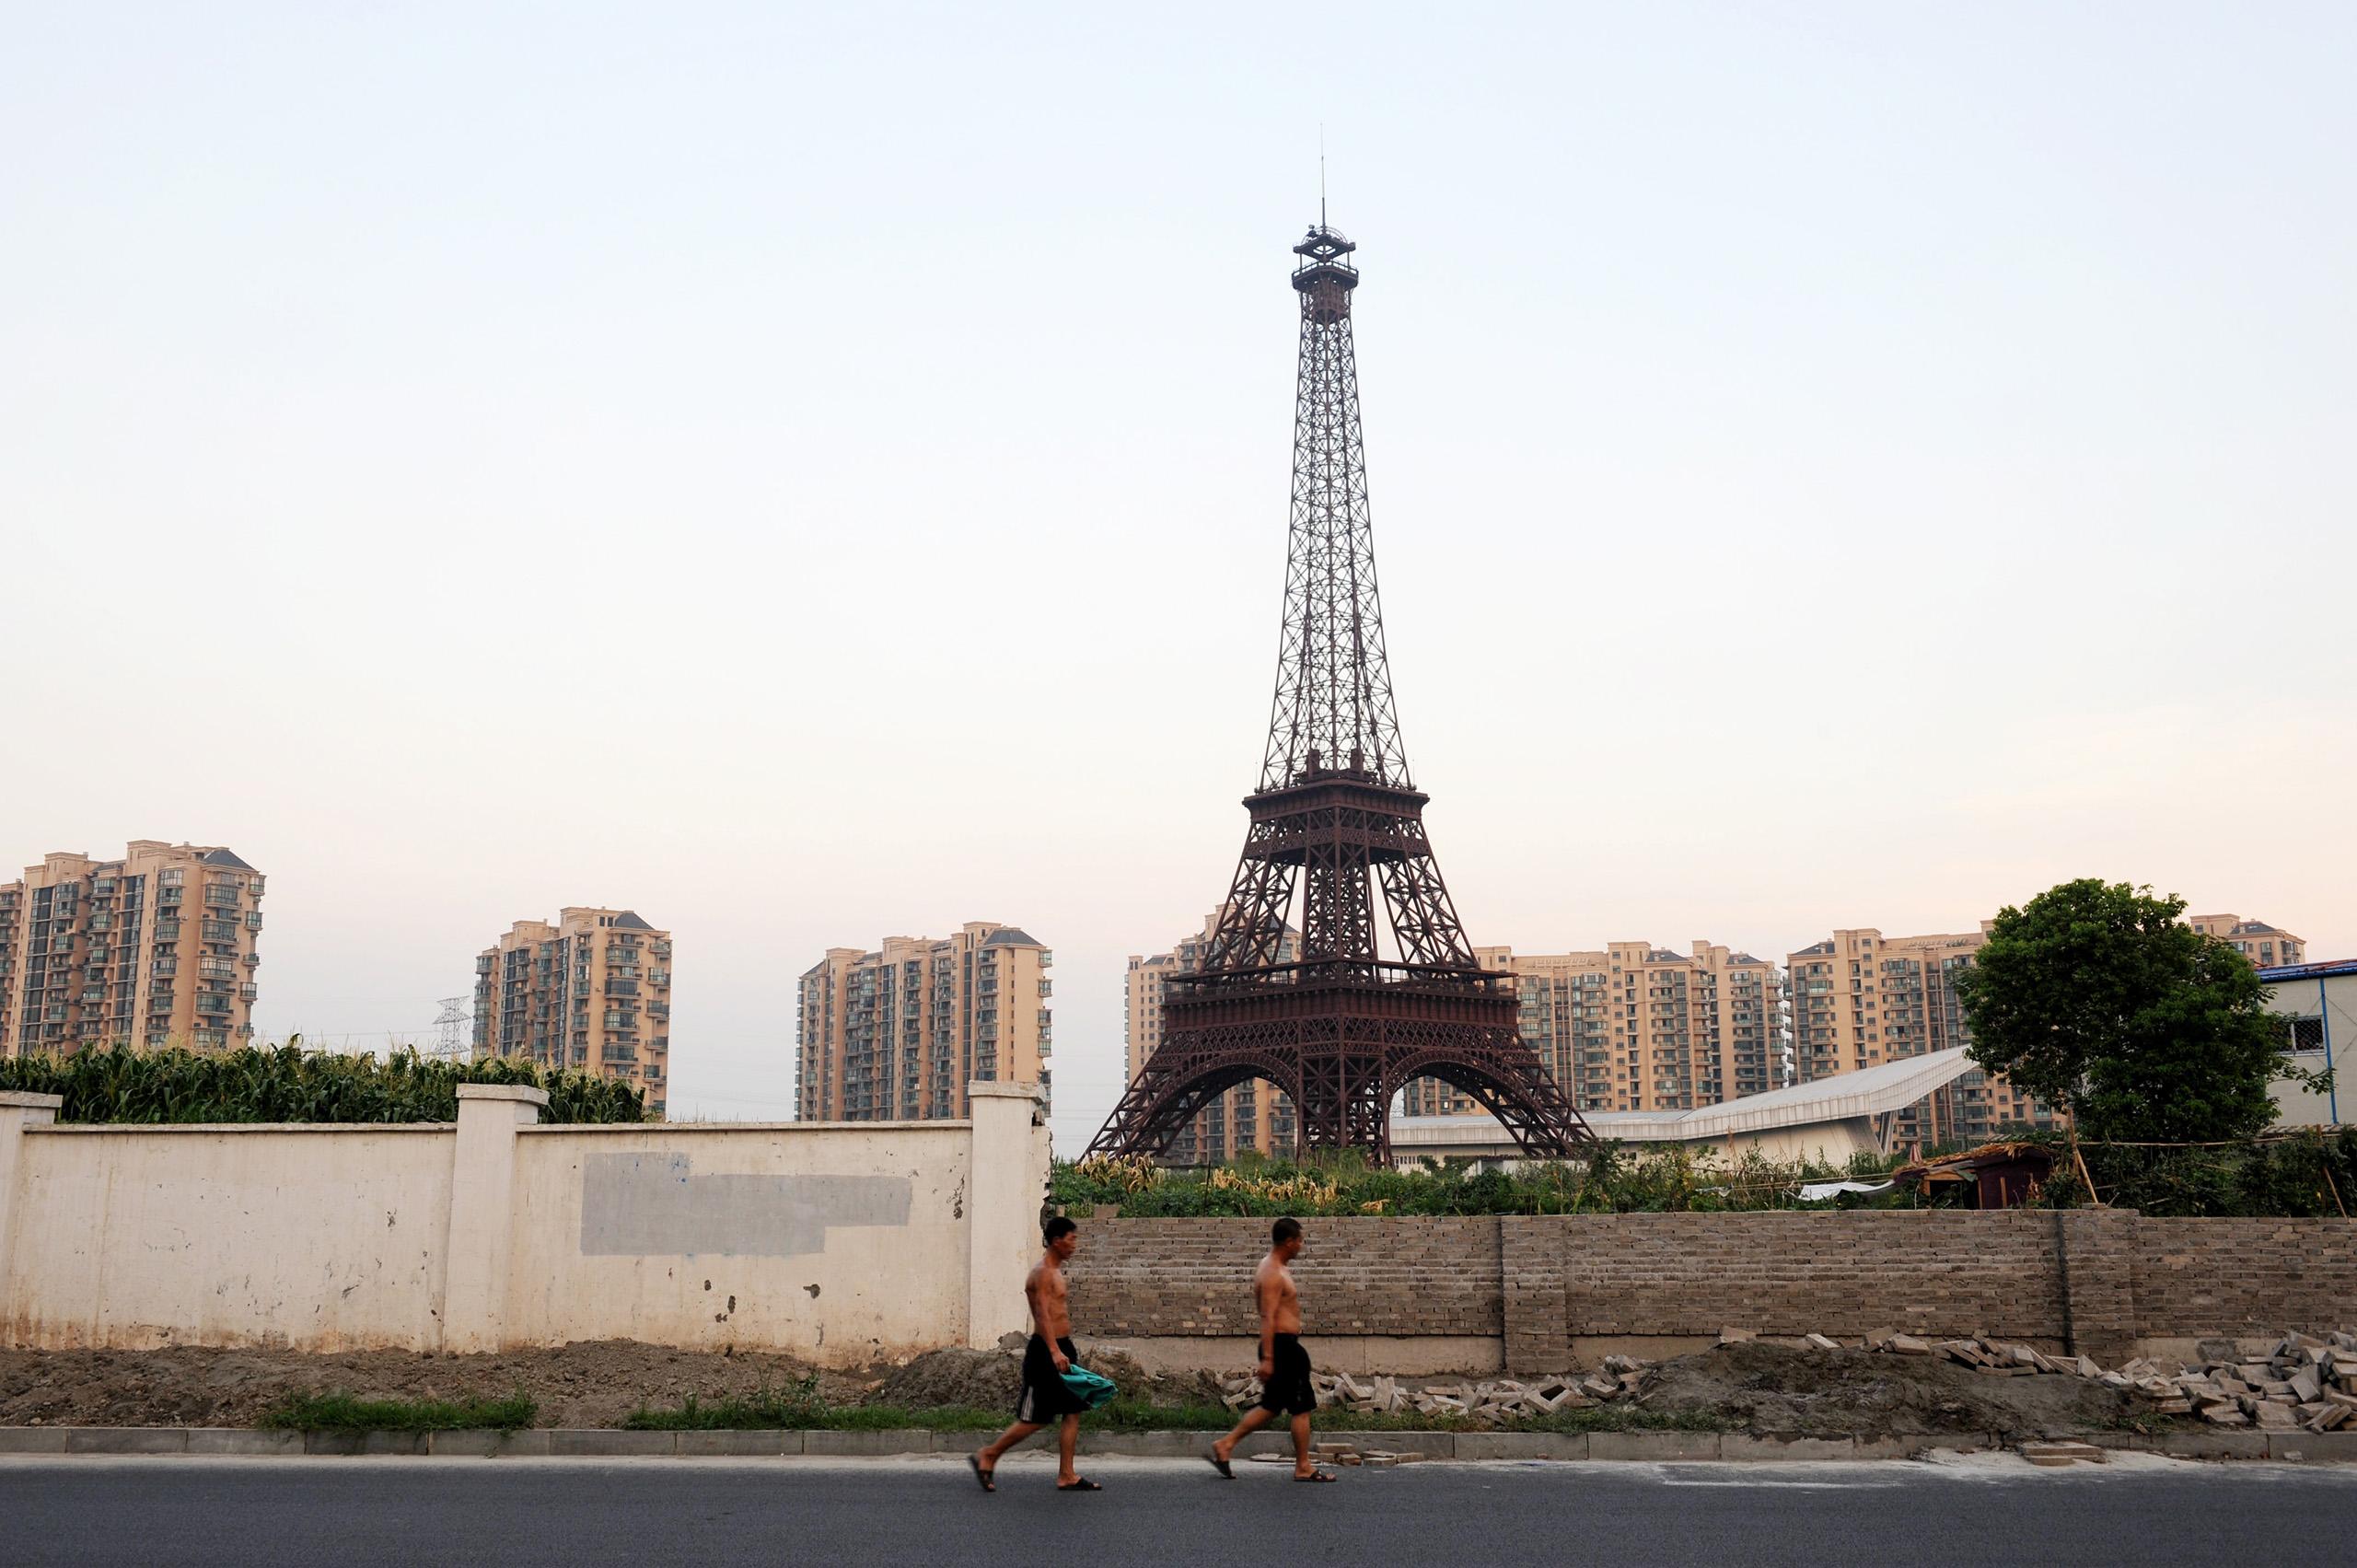 Pedestrians walk past a half-sized replica of the Eiffel Tower at Tianducheng, a small Chinese community built to imitate Paris, in Hangzhou city, Zhejiang province.